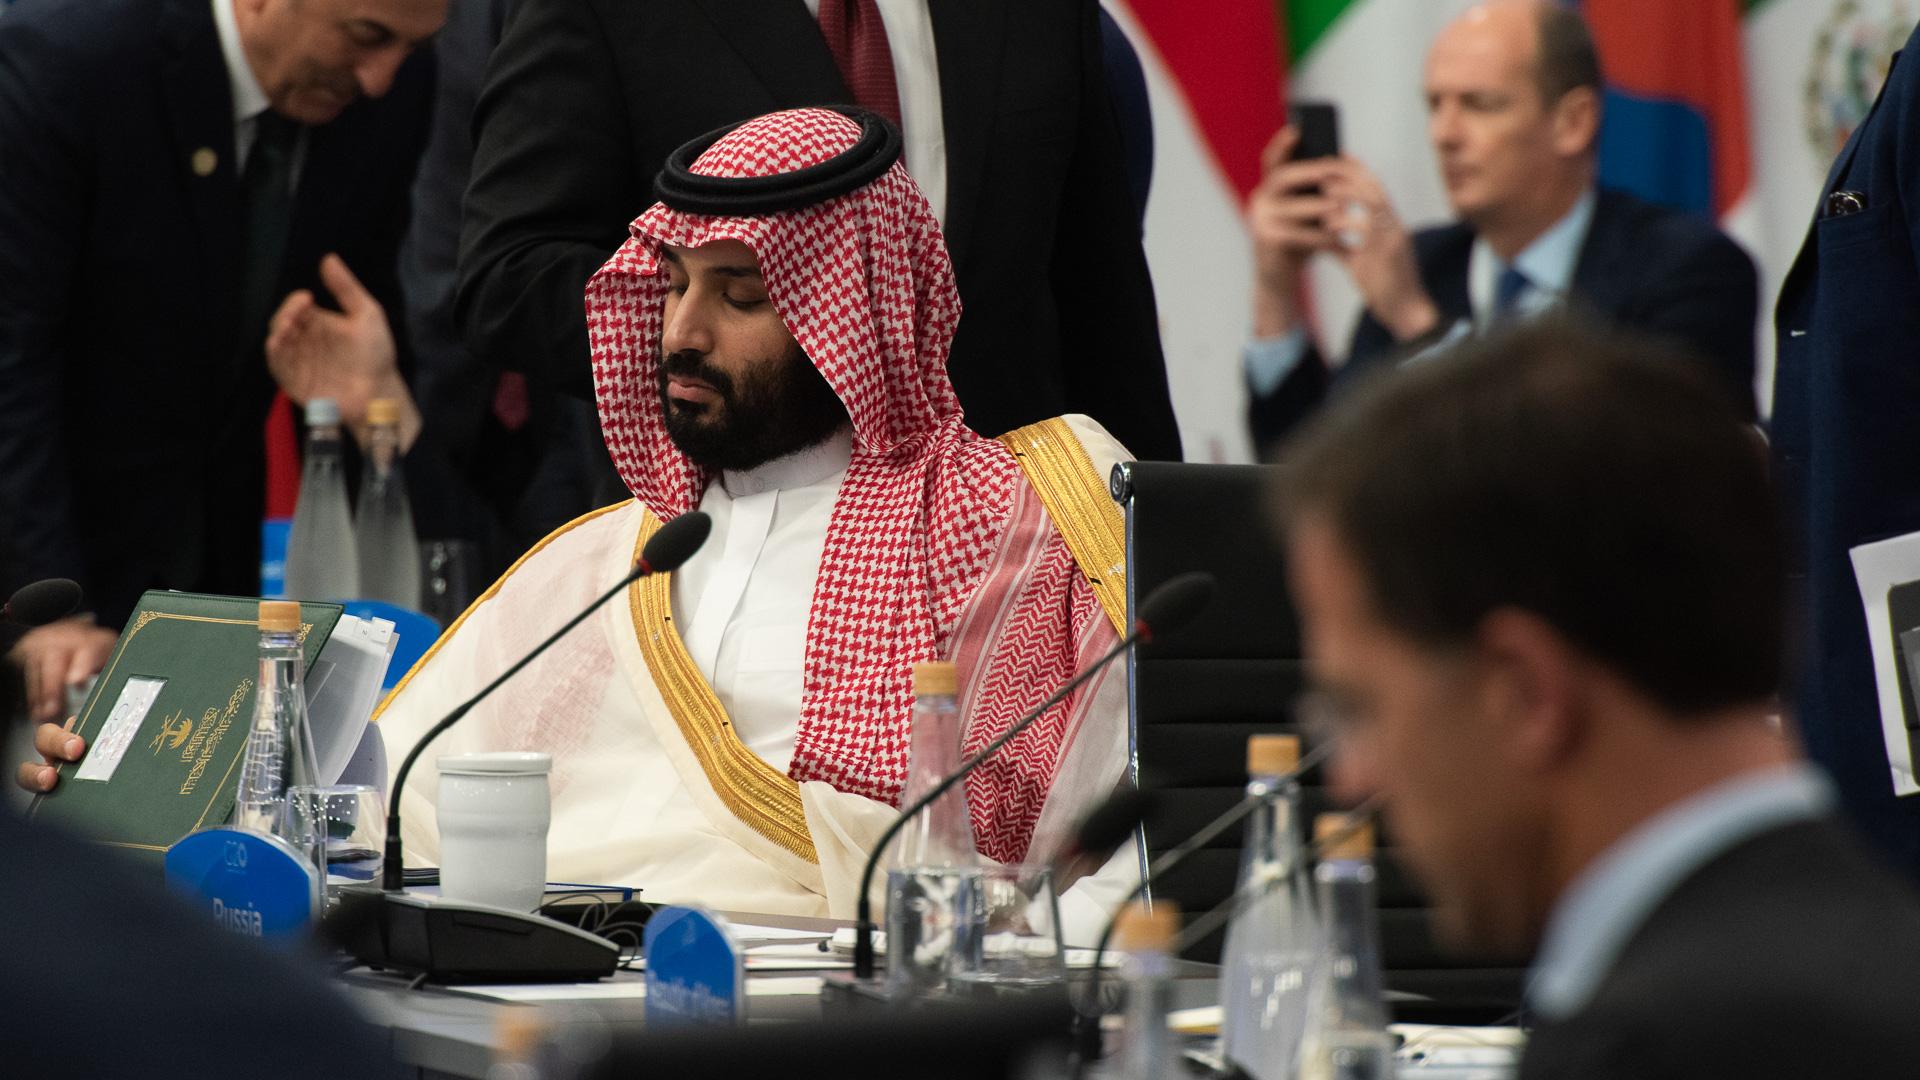 El príncipe Mohammed Bin Salman de Arabia Saudita